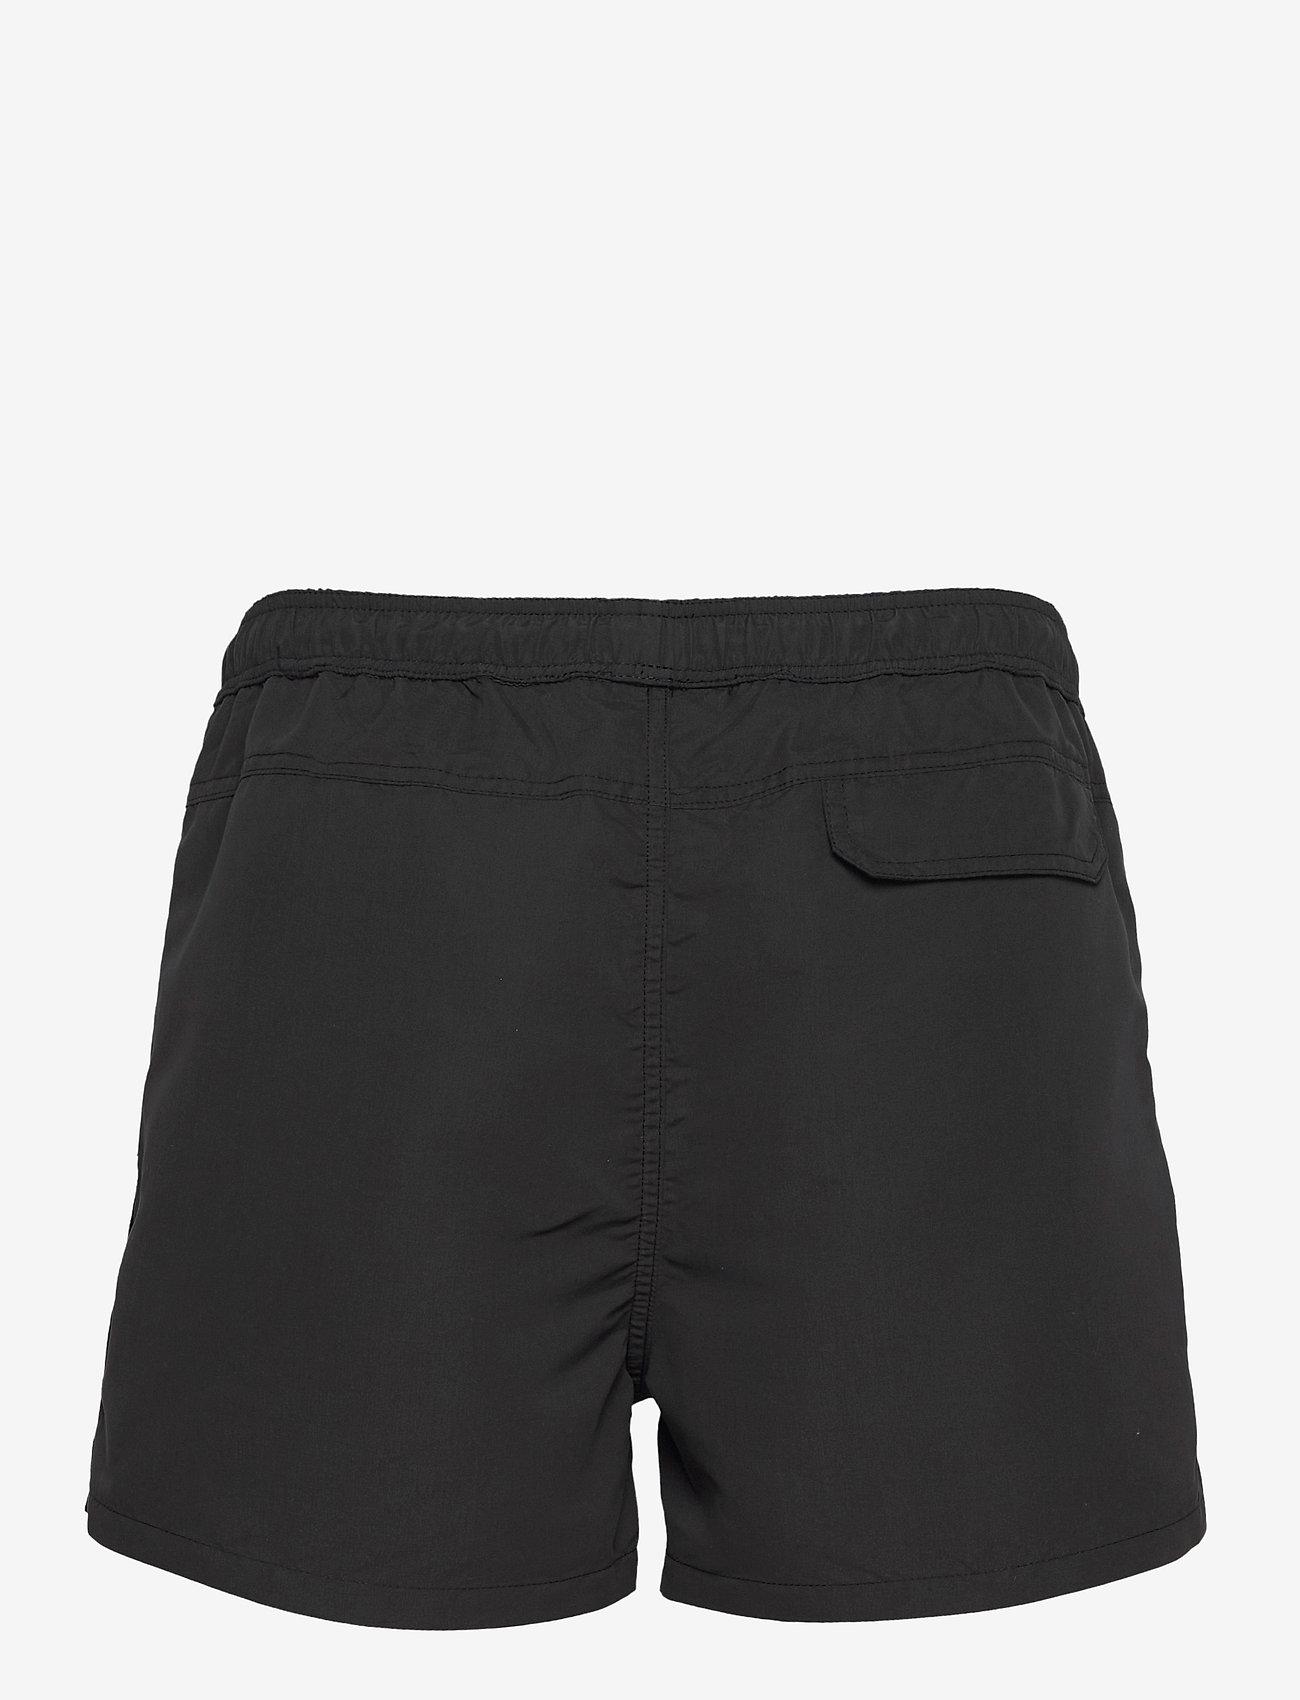 Soulland - William shorts - shorts de bain - black - 2